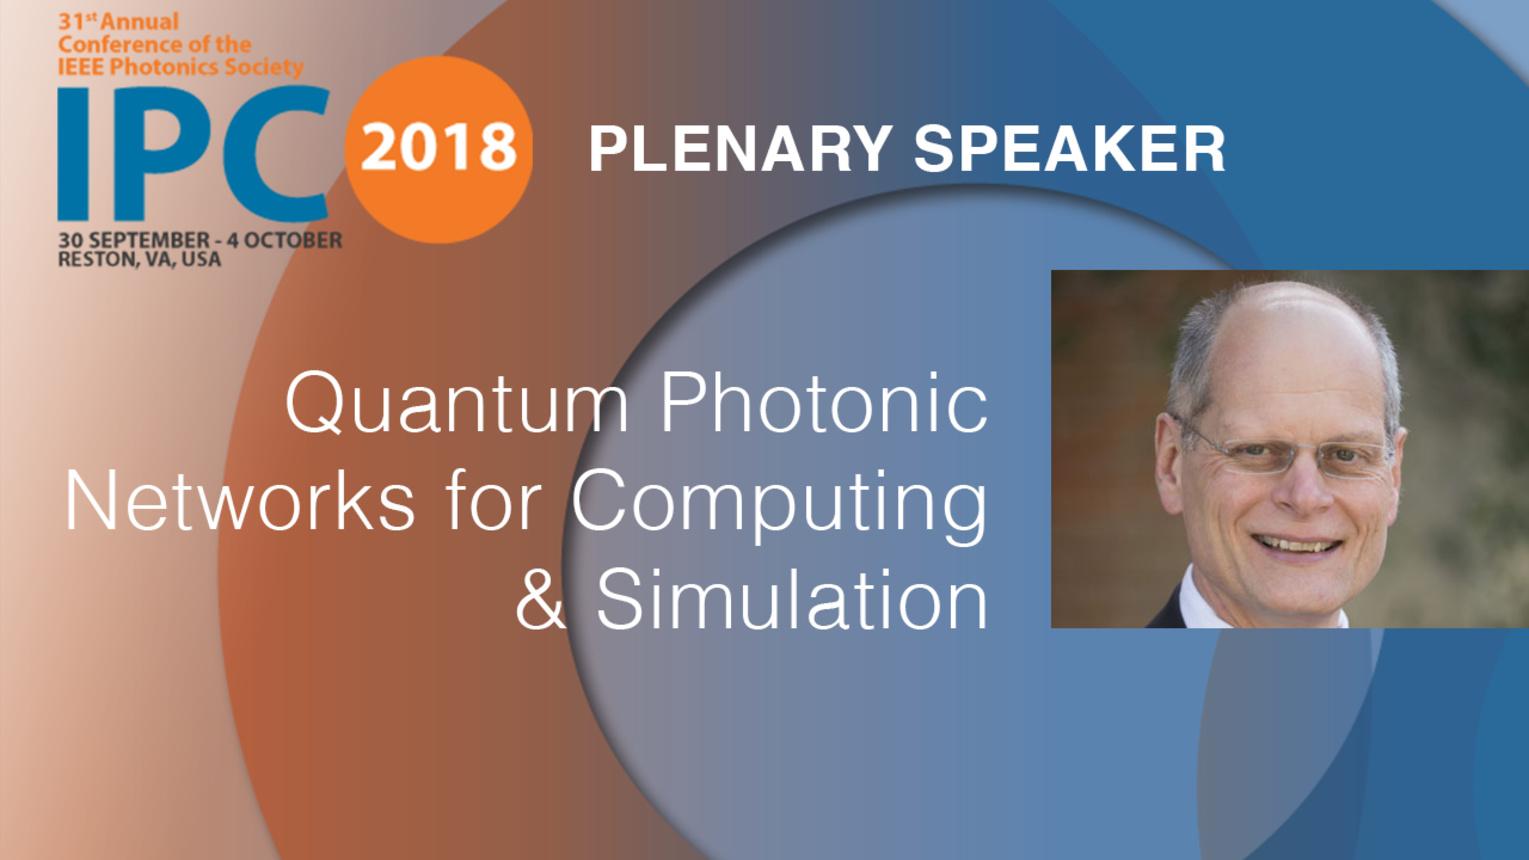 Quantum Photonic Networks for Computing and Simulation - Plenary Speaker: Ian Walmsley - IPC 2018